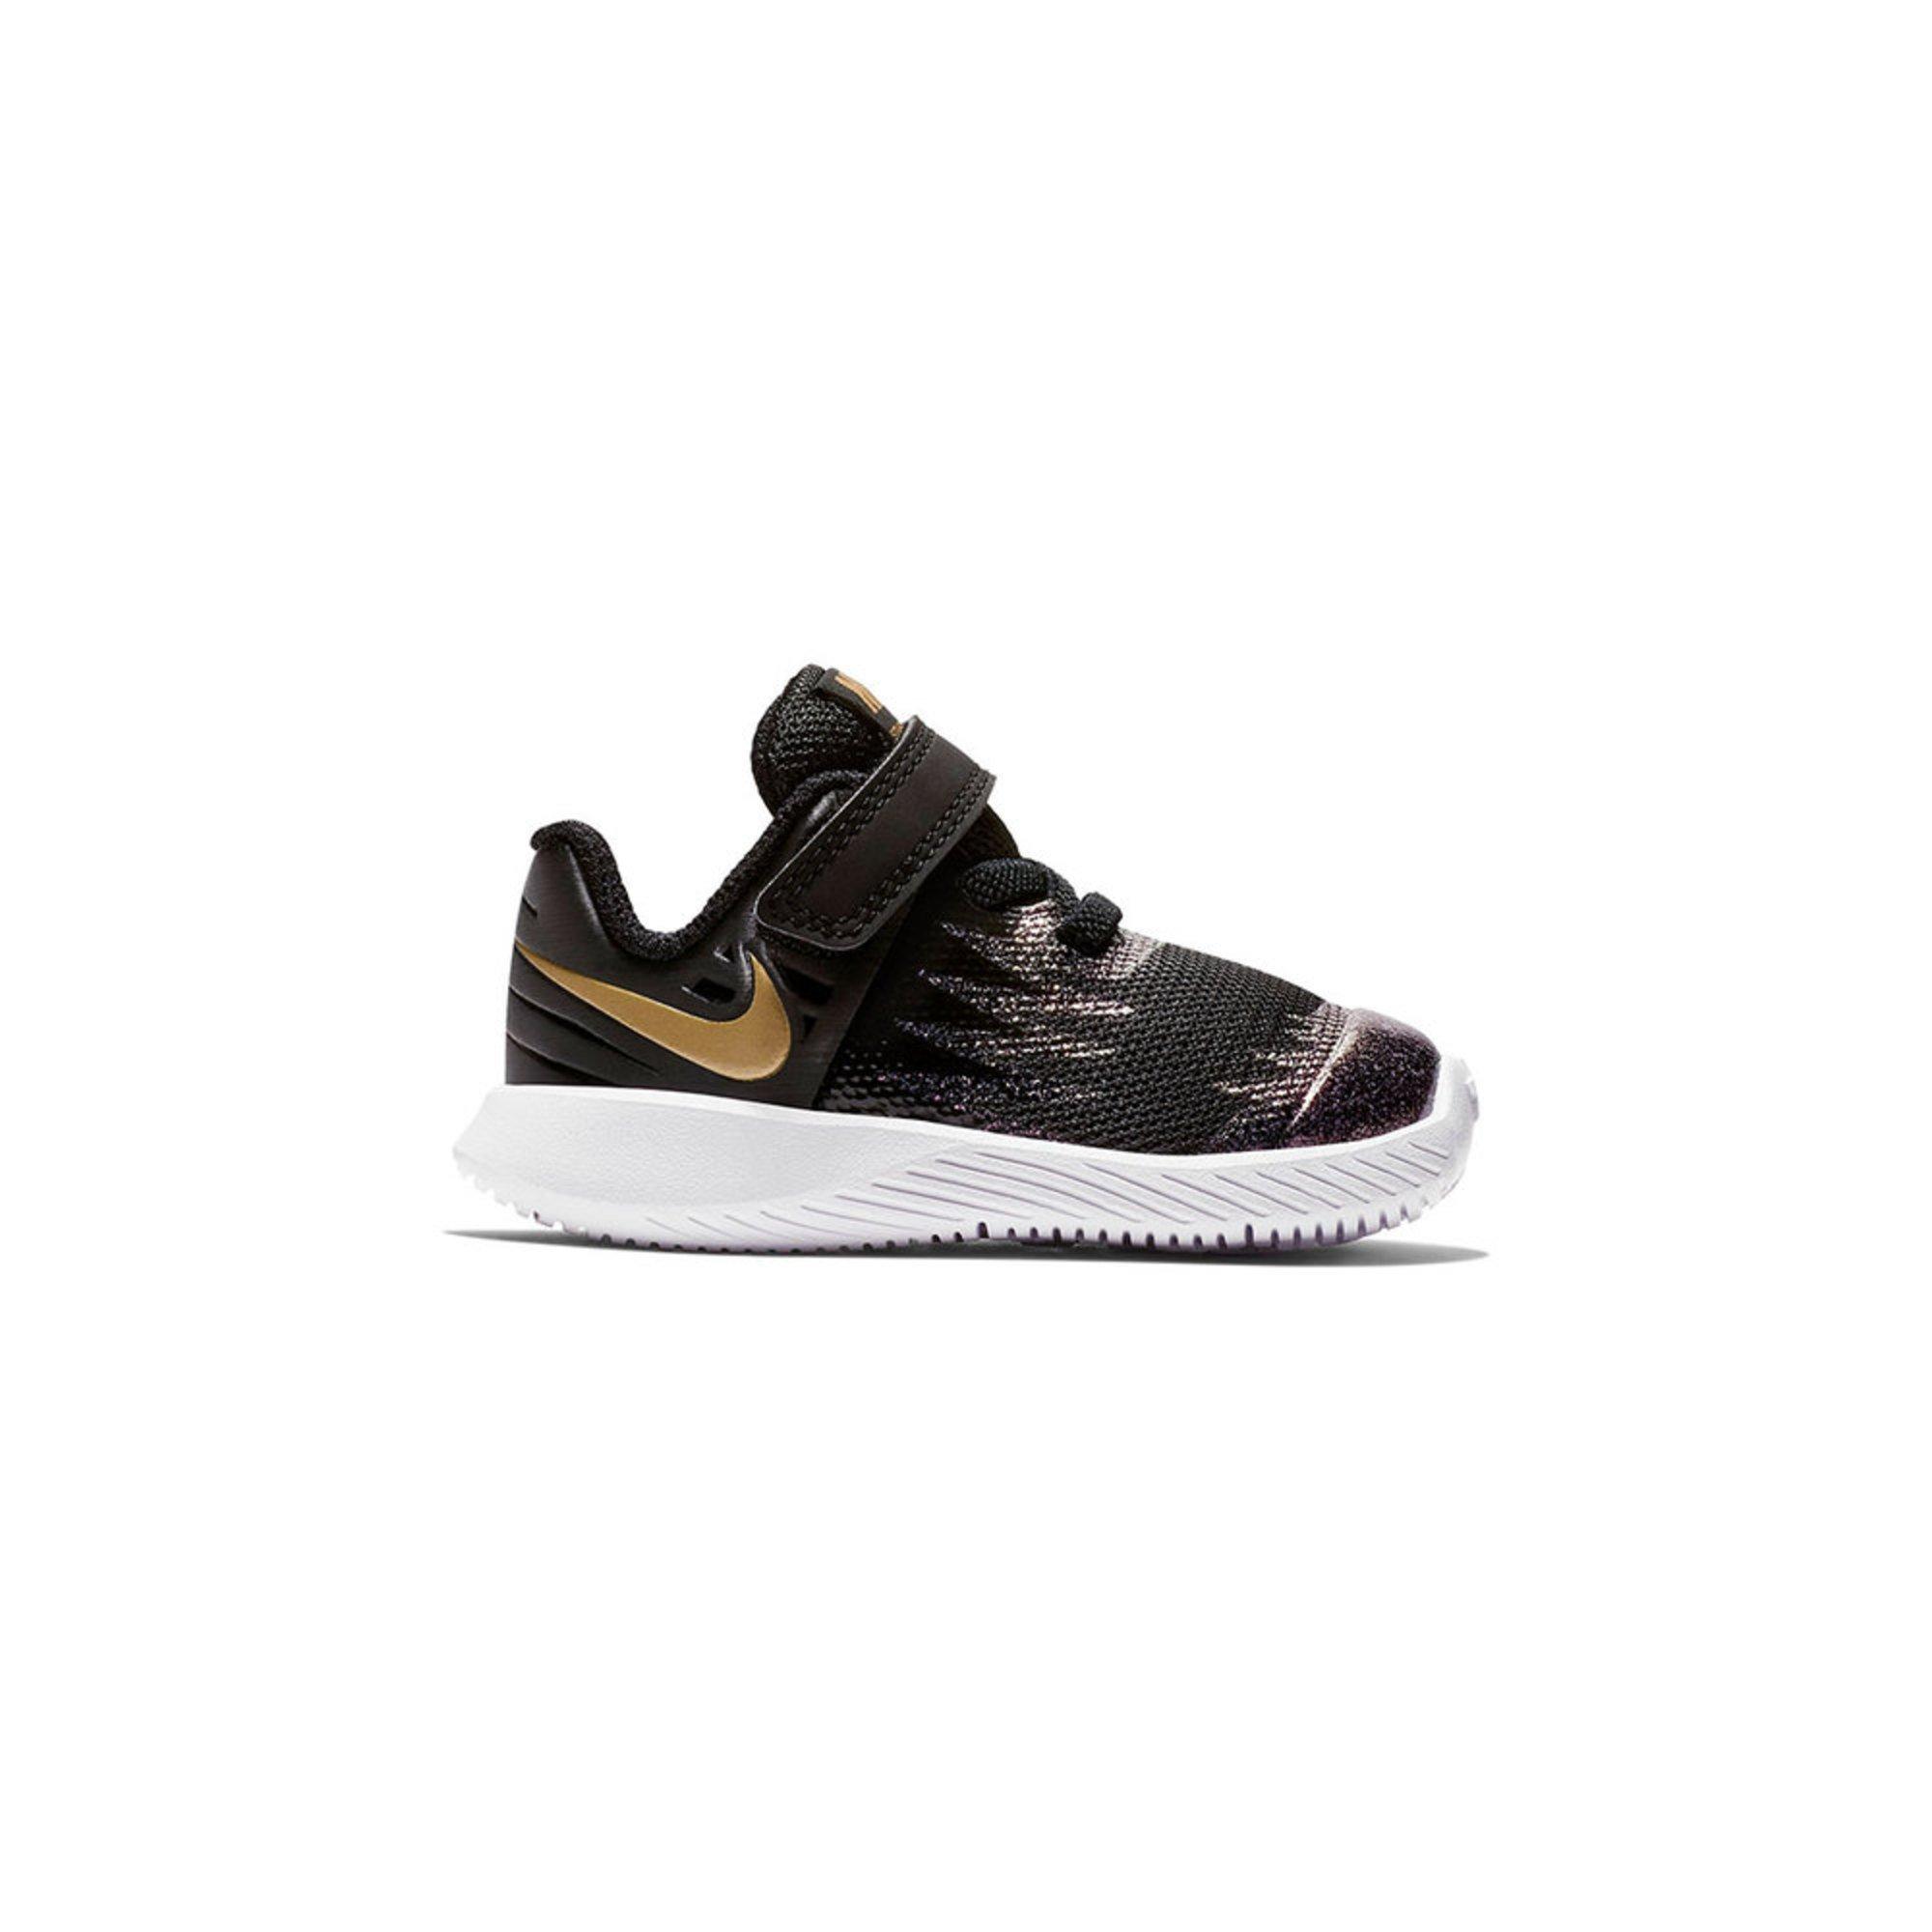 a6ae7f28a087 Nike. Nike Girls Star Runner Shield Running Shoe (Infant Toddler)